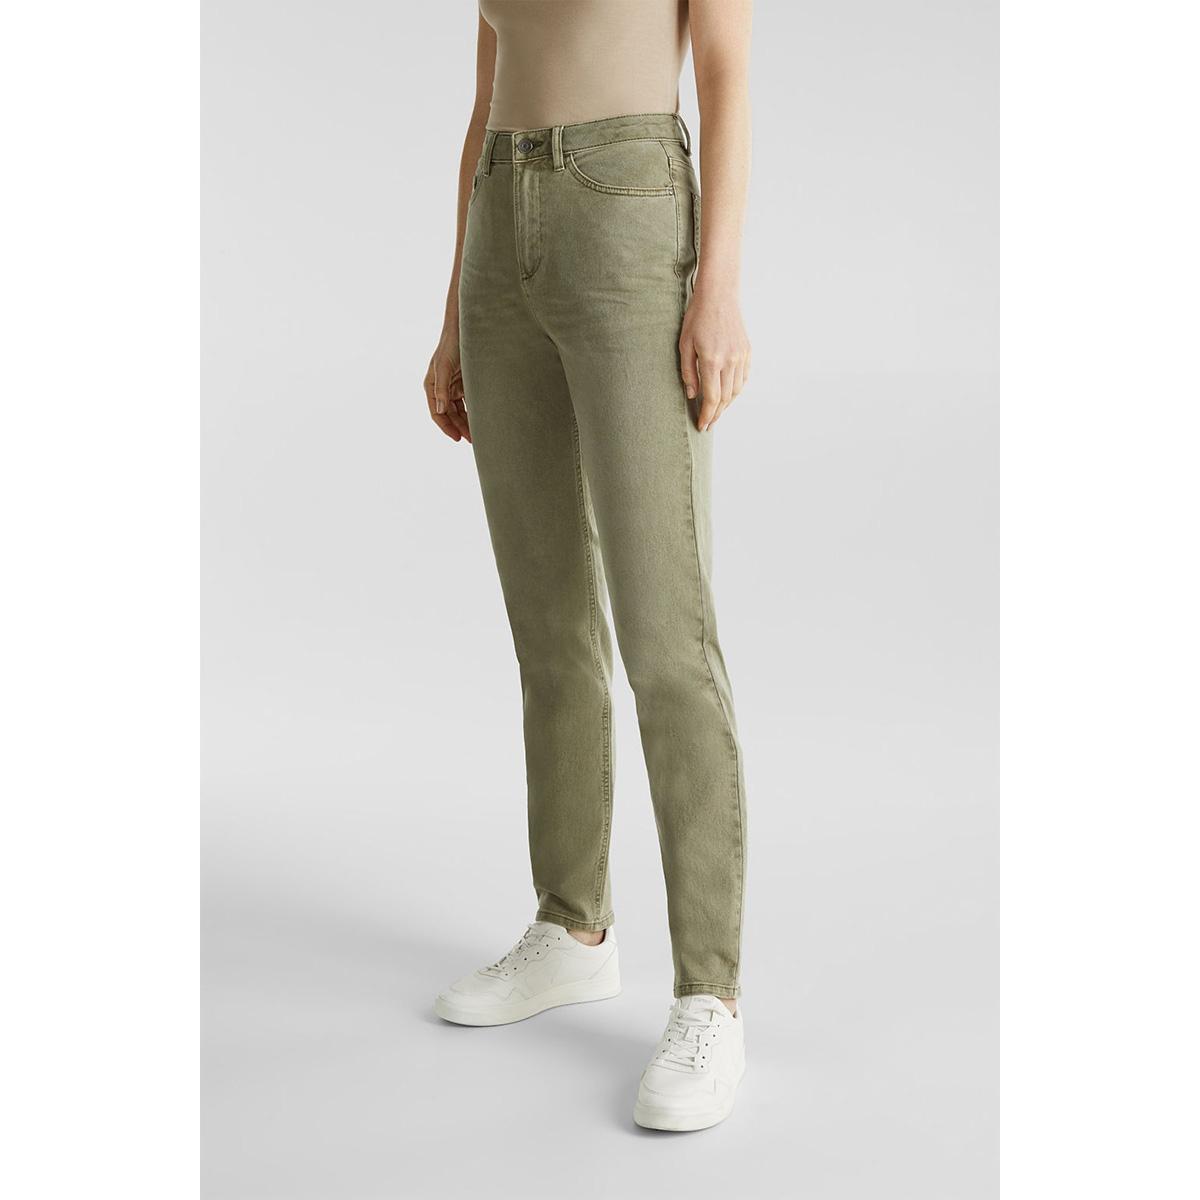 stretchjeans met modieuze fit 010ee1b315 esprit jeans e350